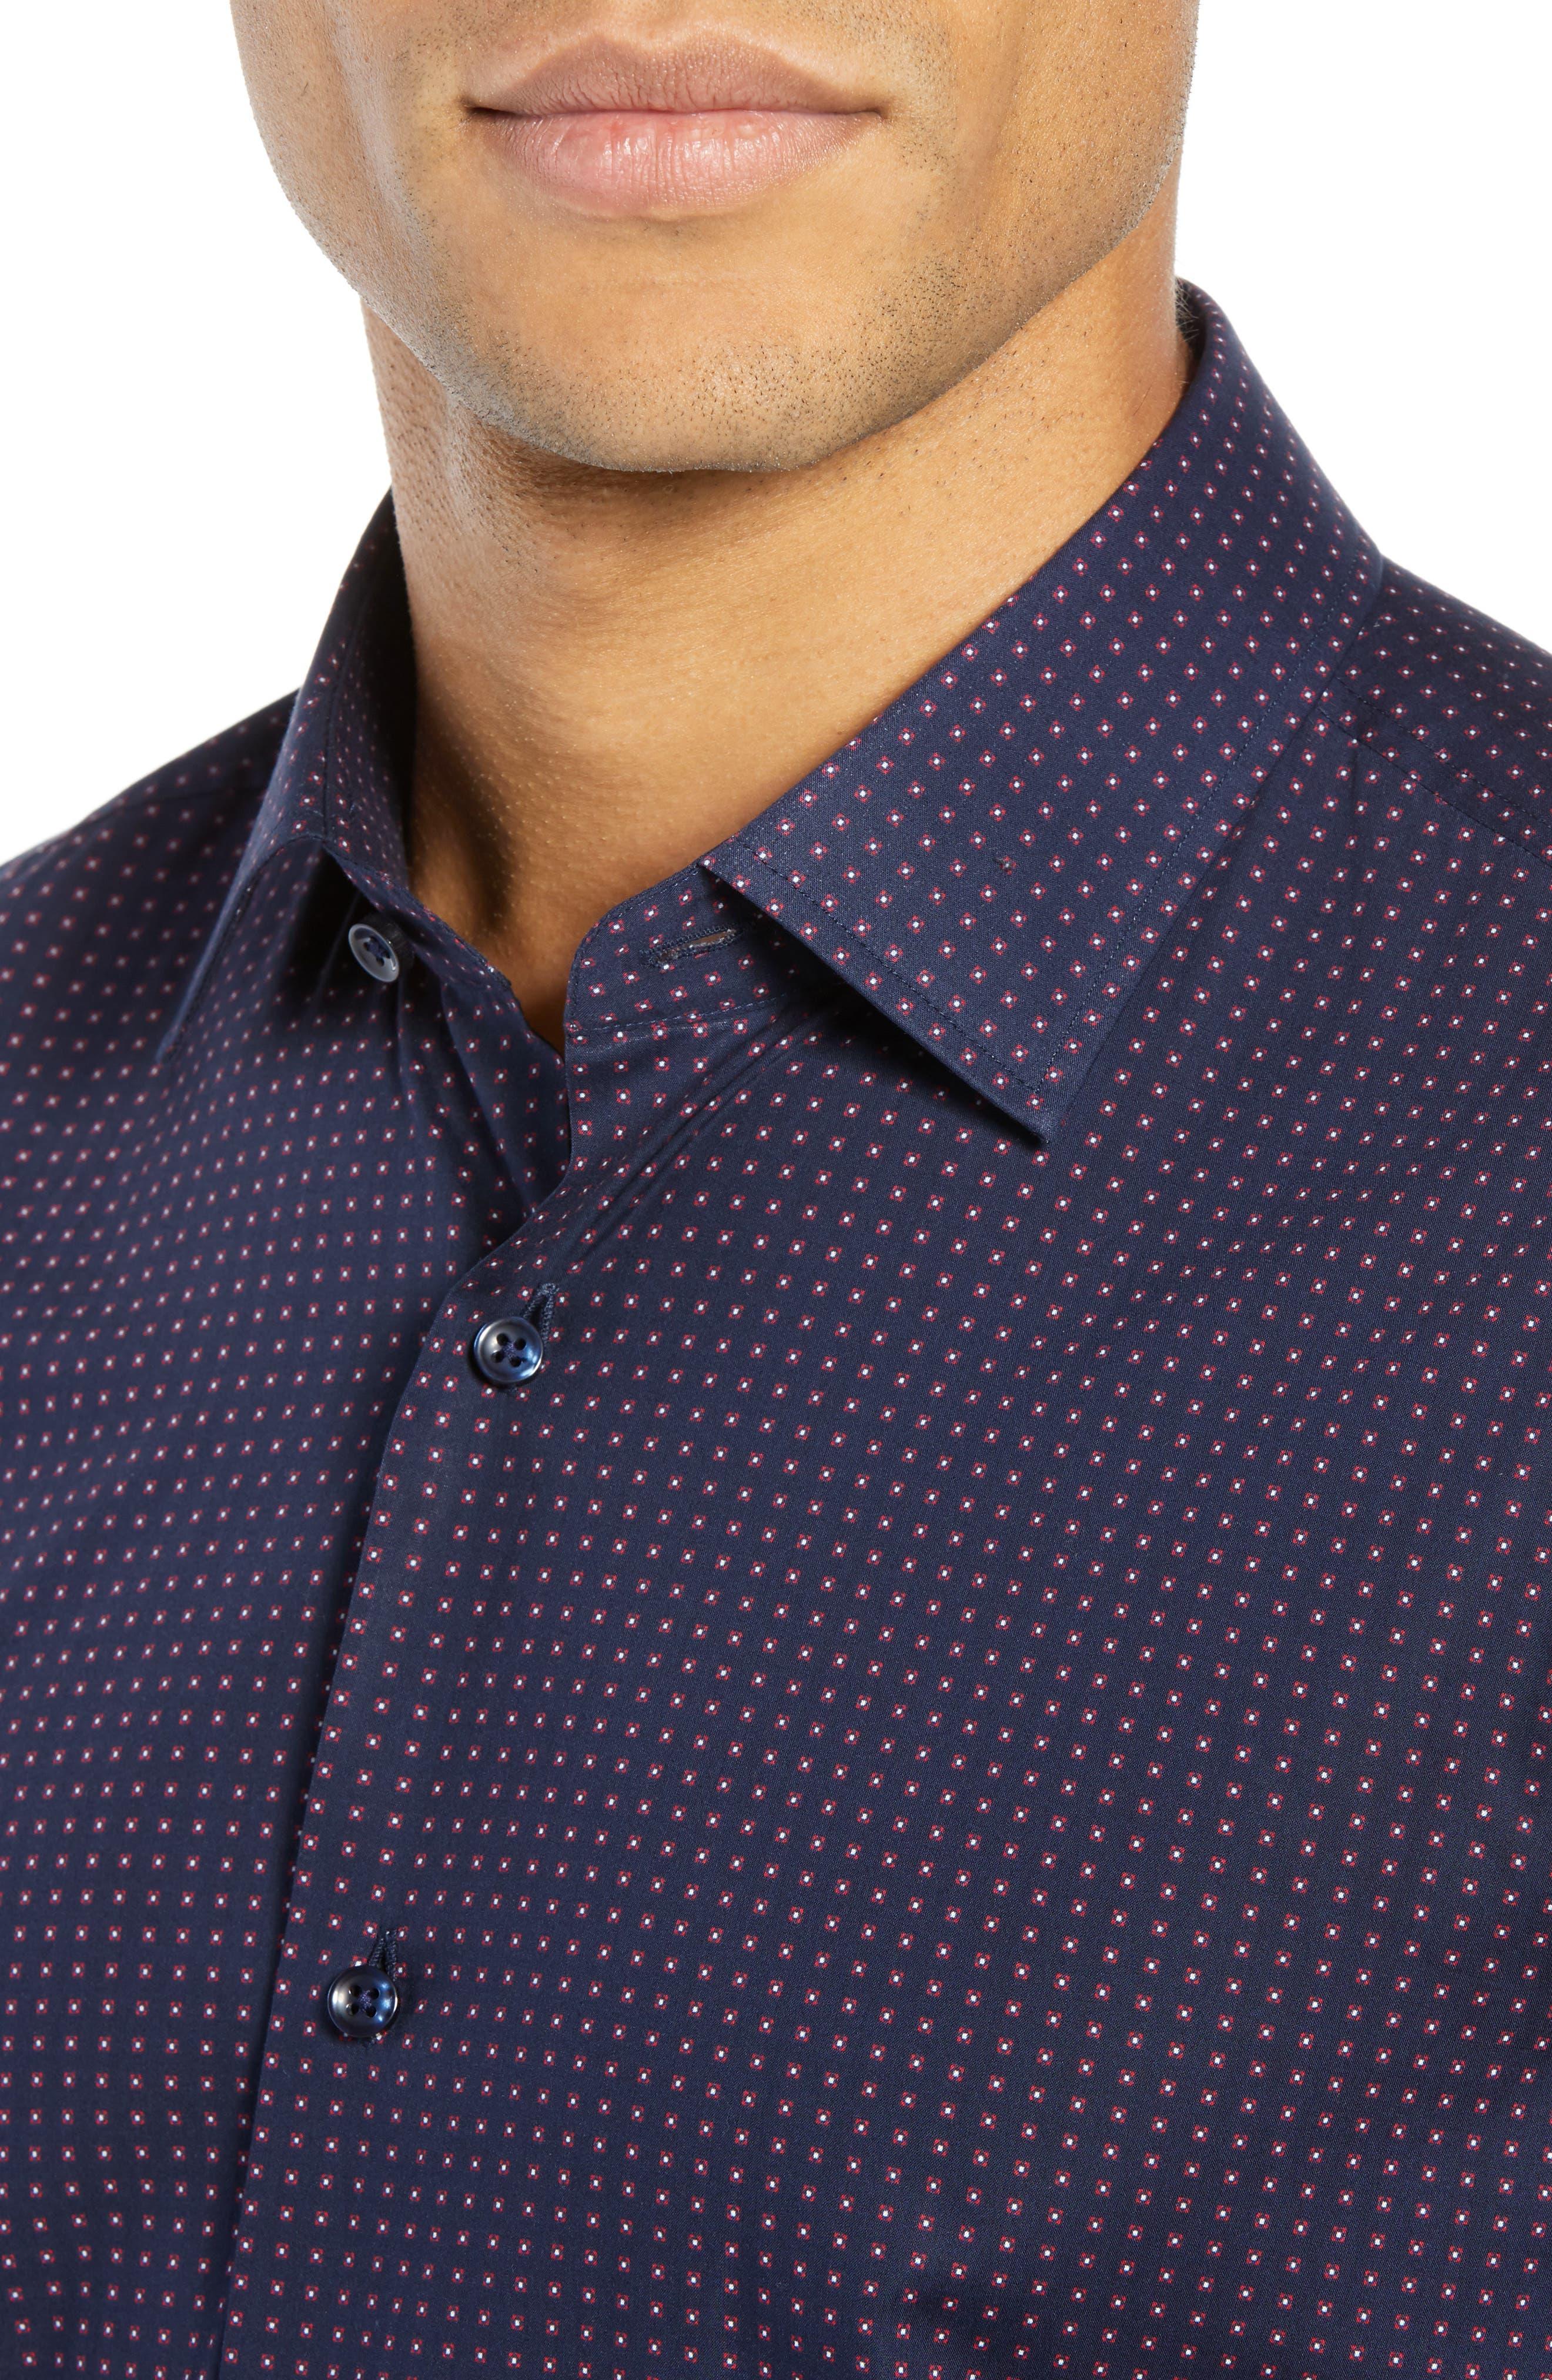 Jenno Slim Fit Dot Dress Shirt,                             Alternate thumbnail 2, color,                             NAVY